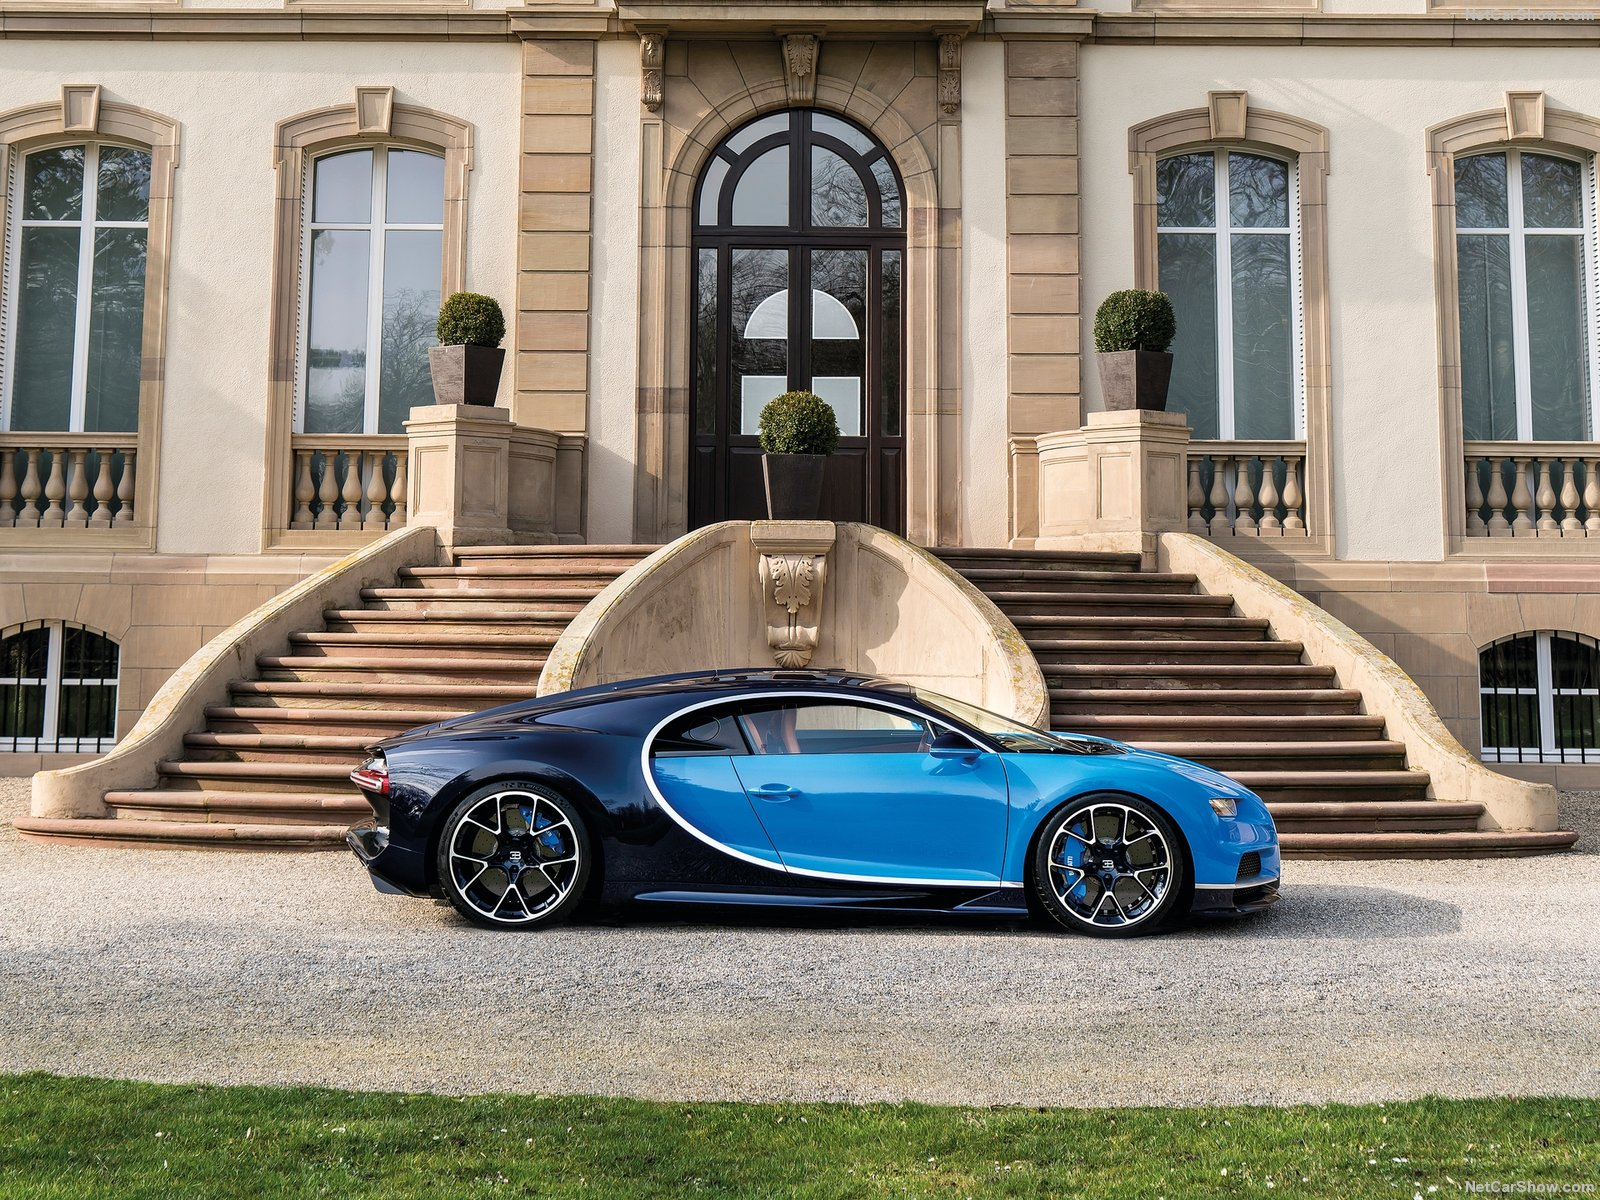 Bugatti-Chiron_2017_1600x1200_wallpaper_10